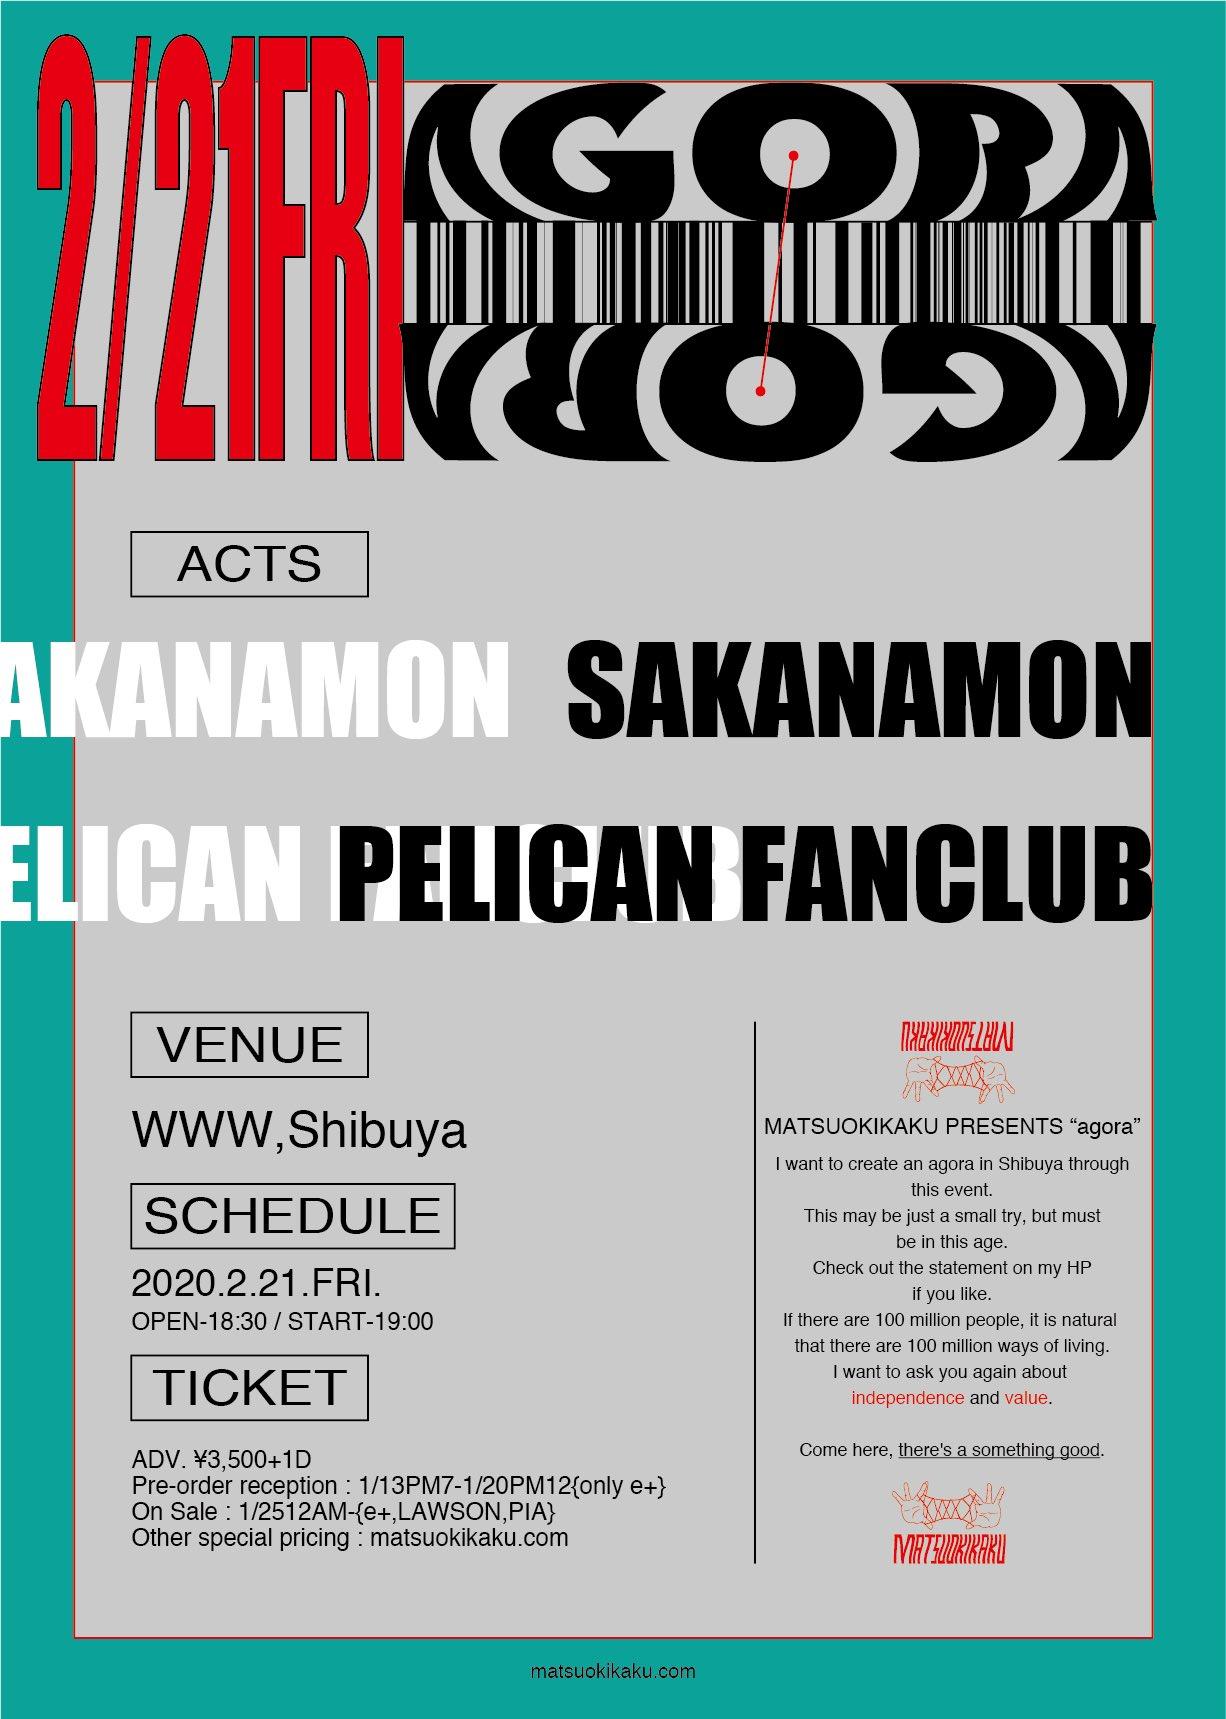 SAKANAMON / PELICAN FANCLUB